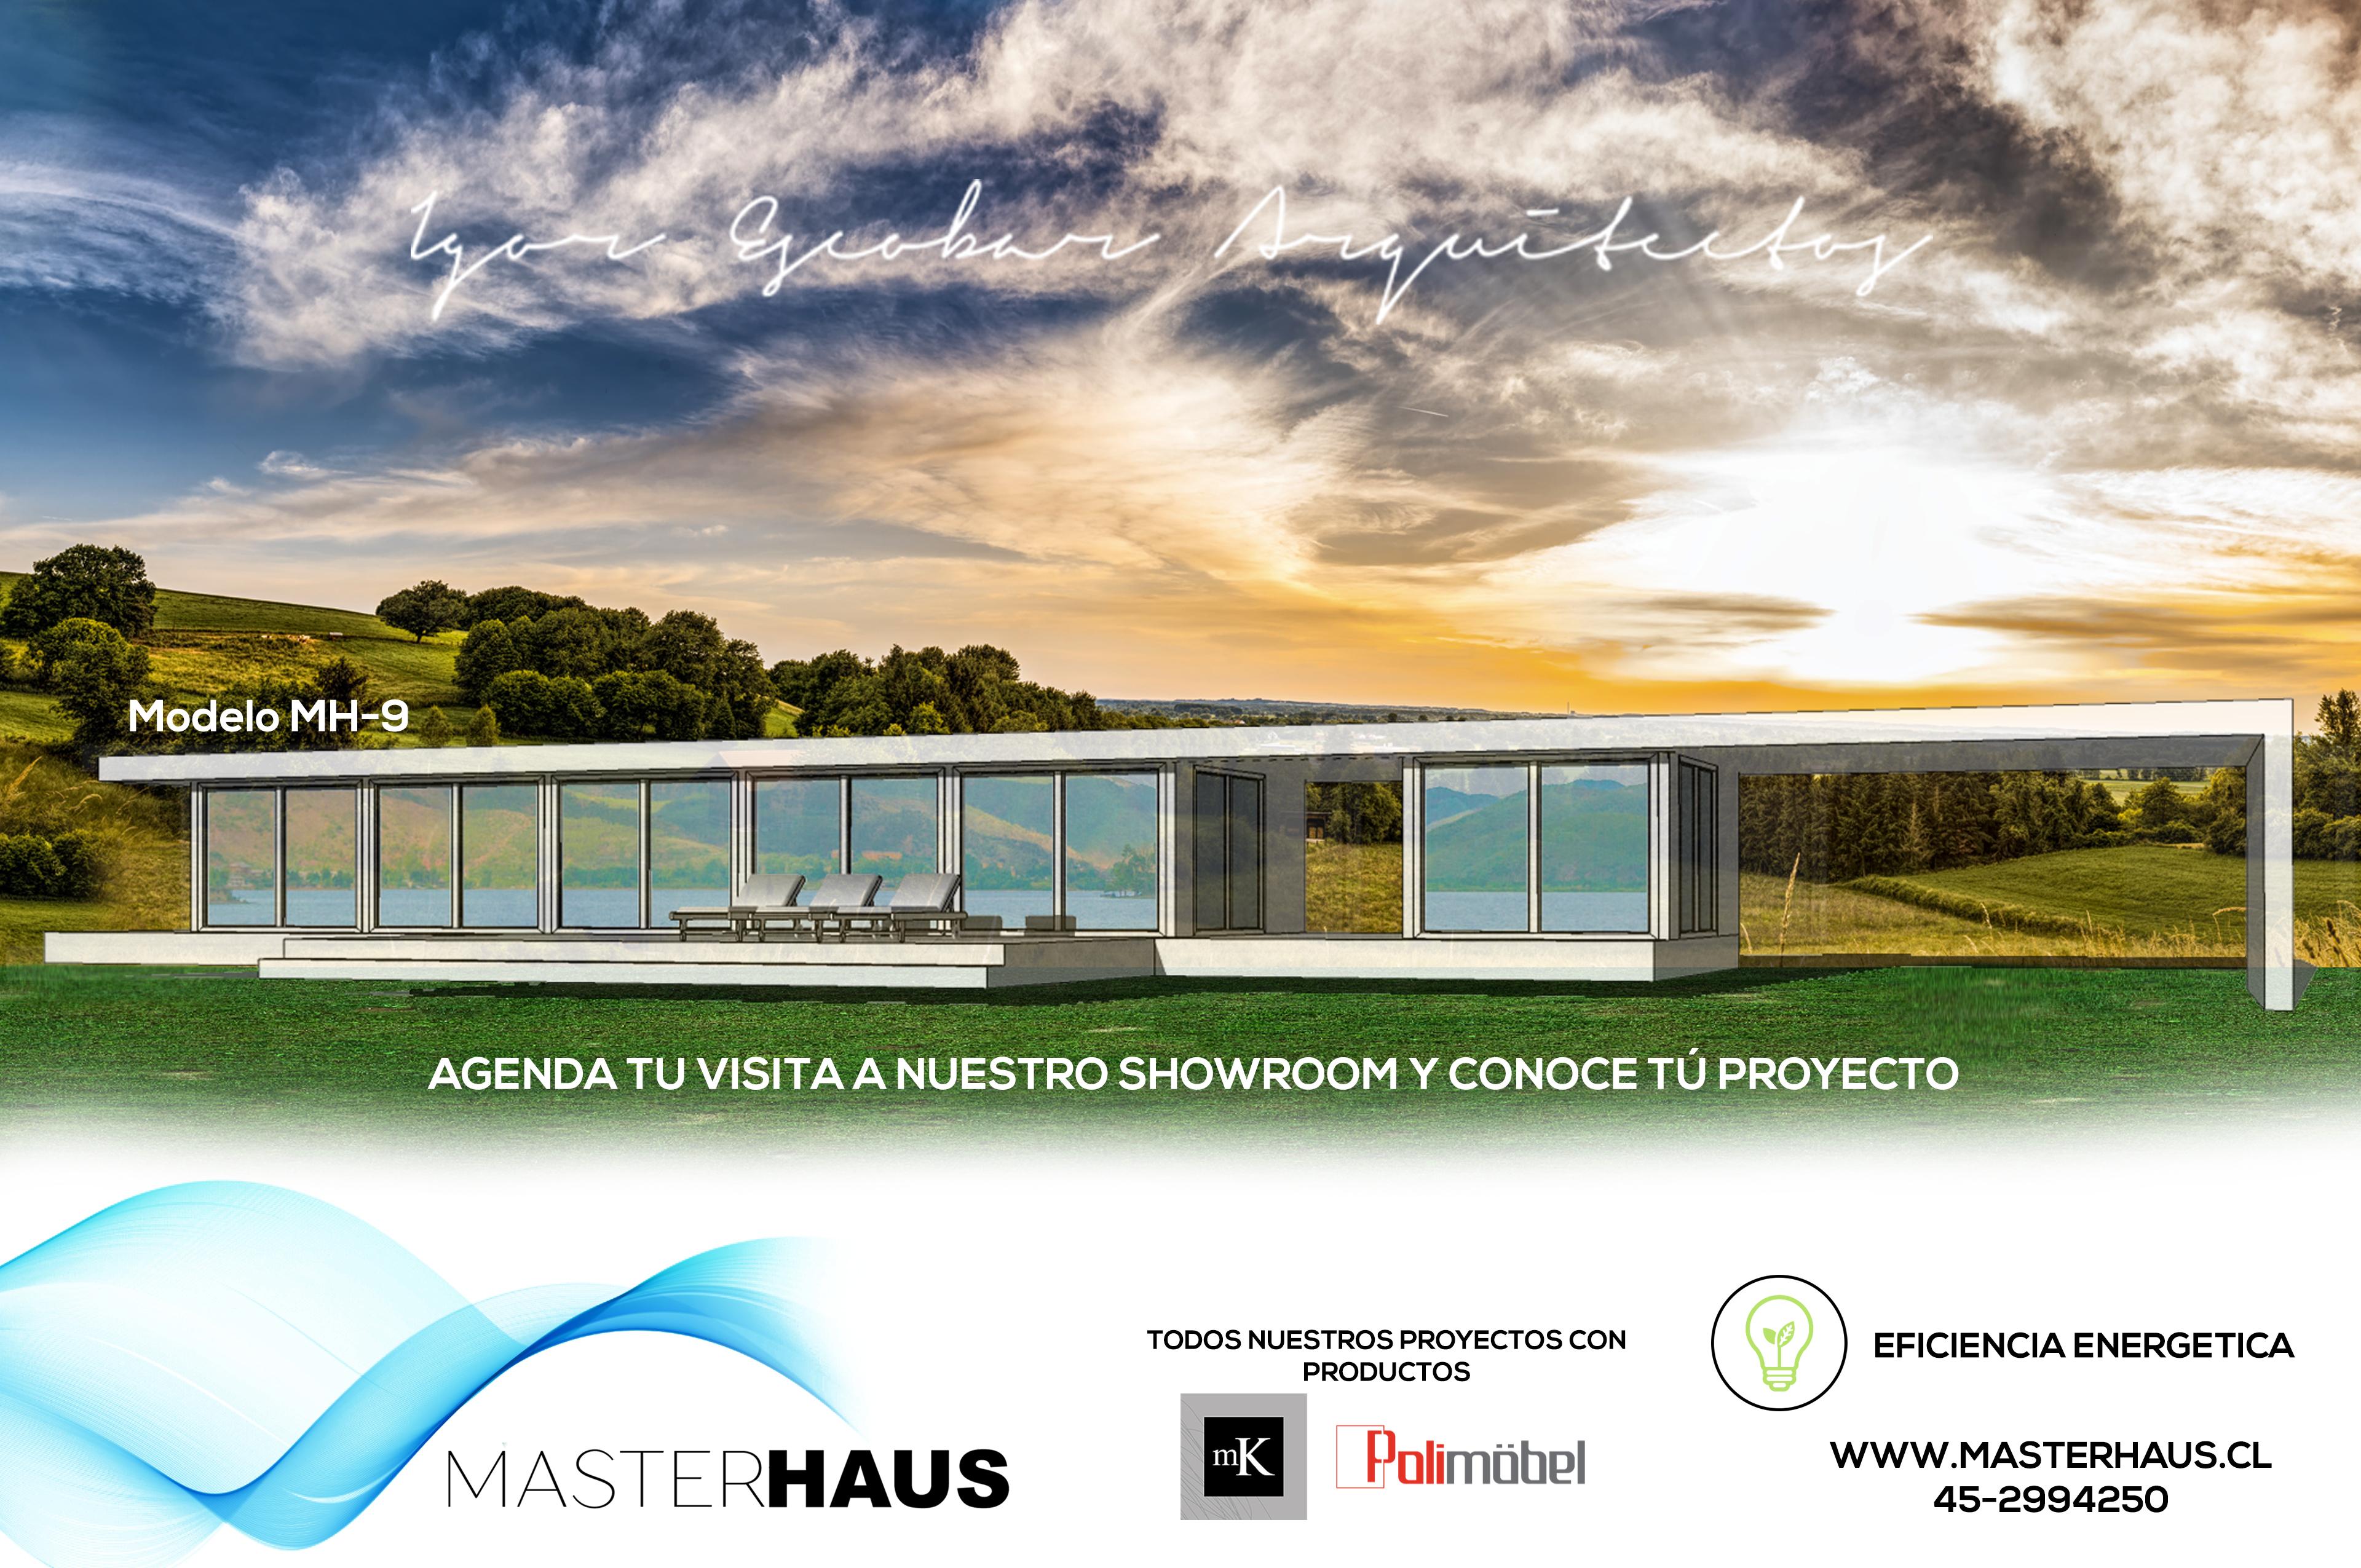 Masterhaus mod. MH-9